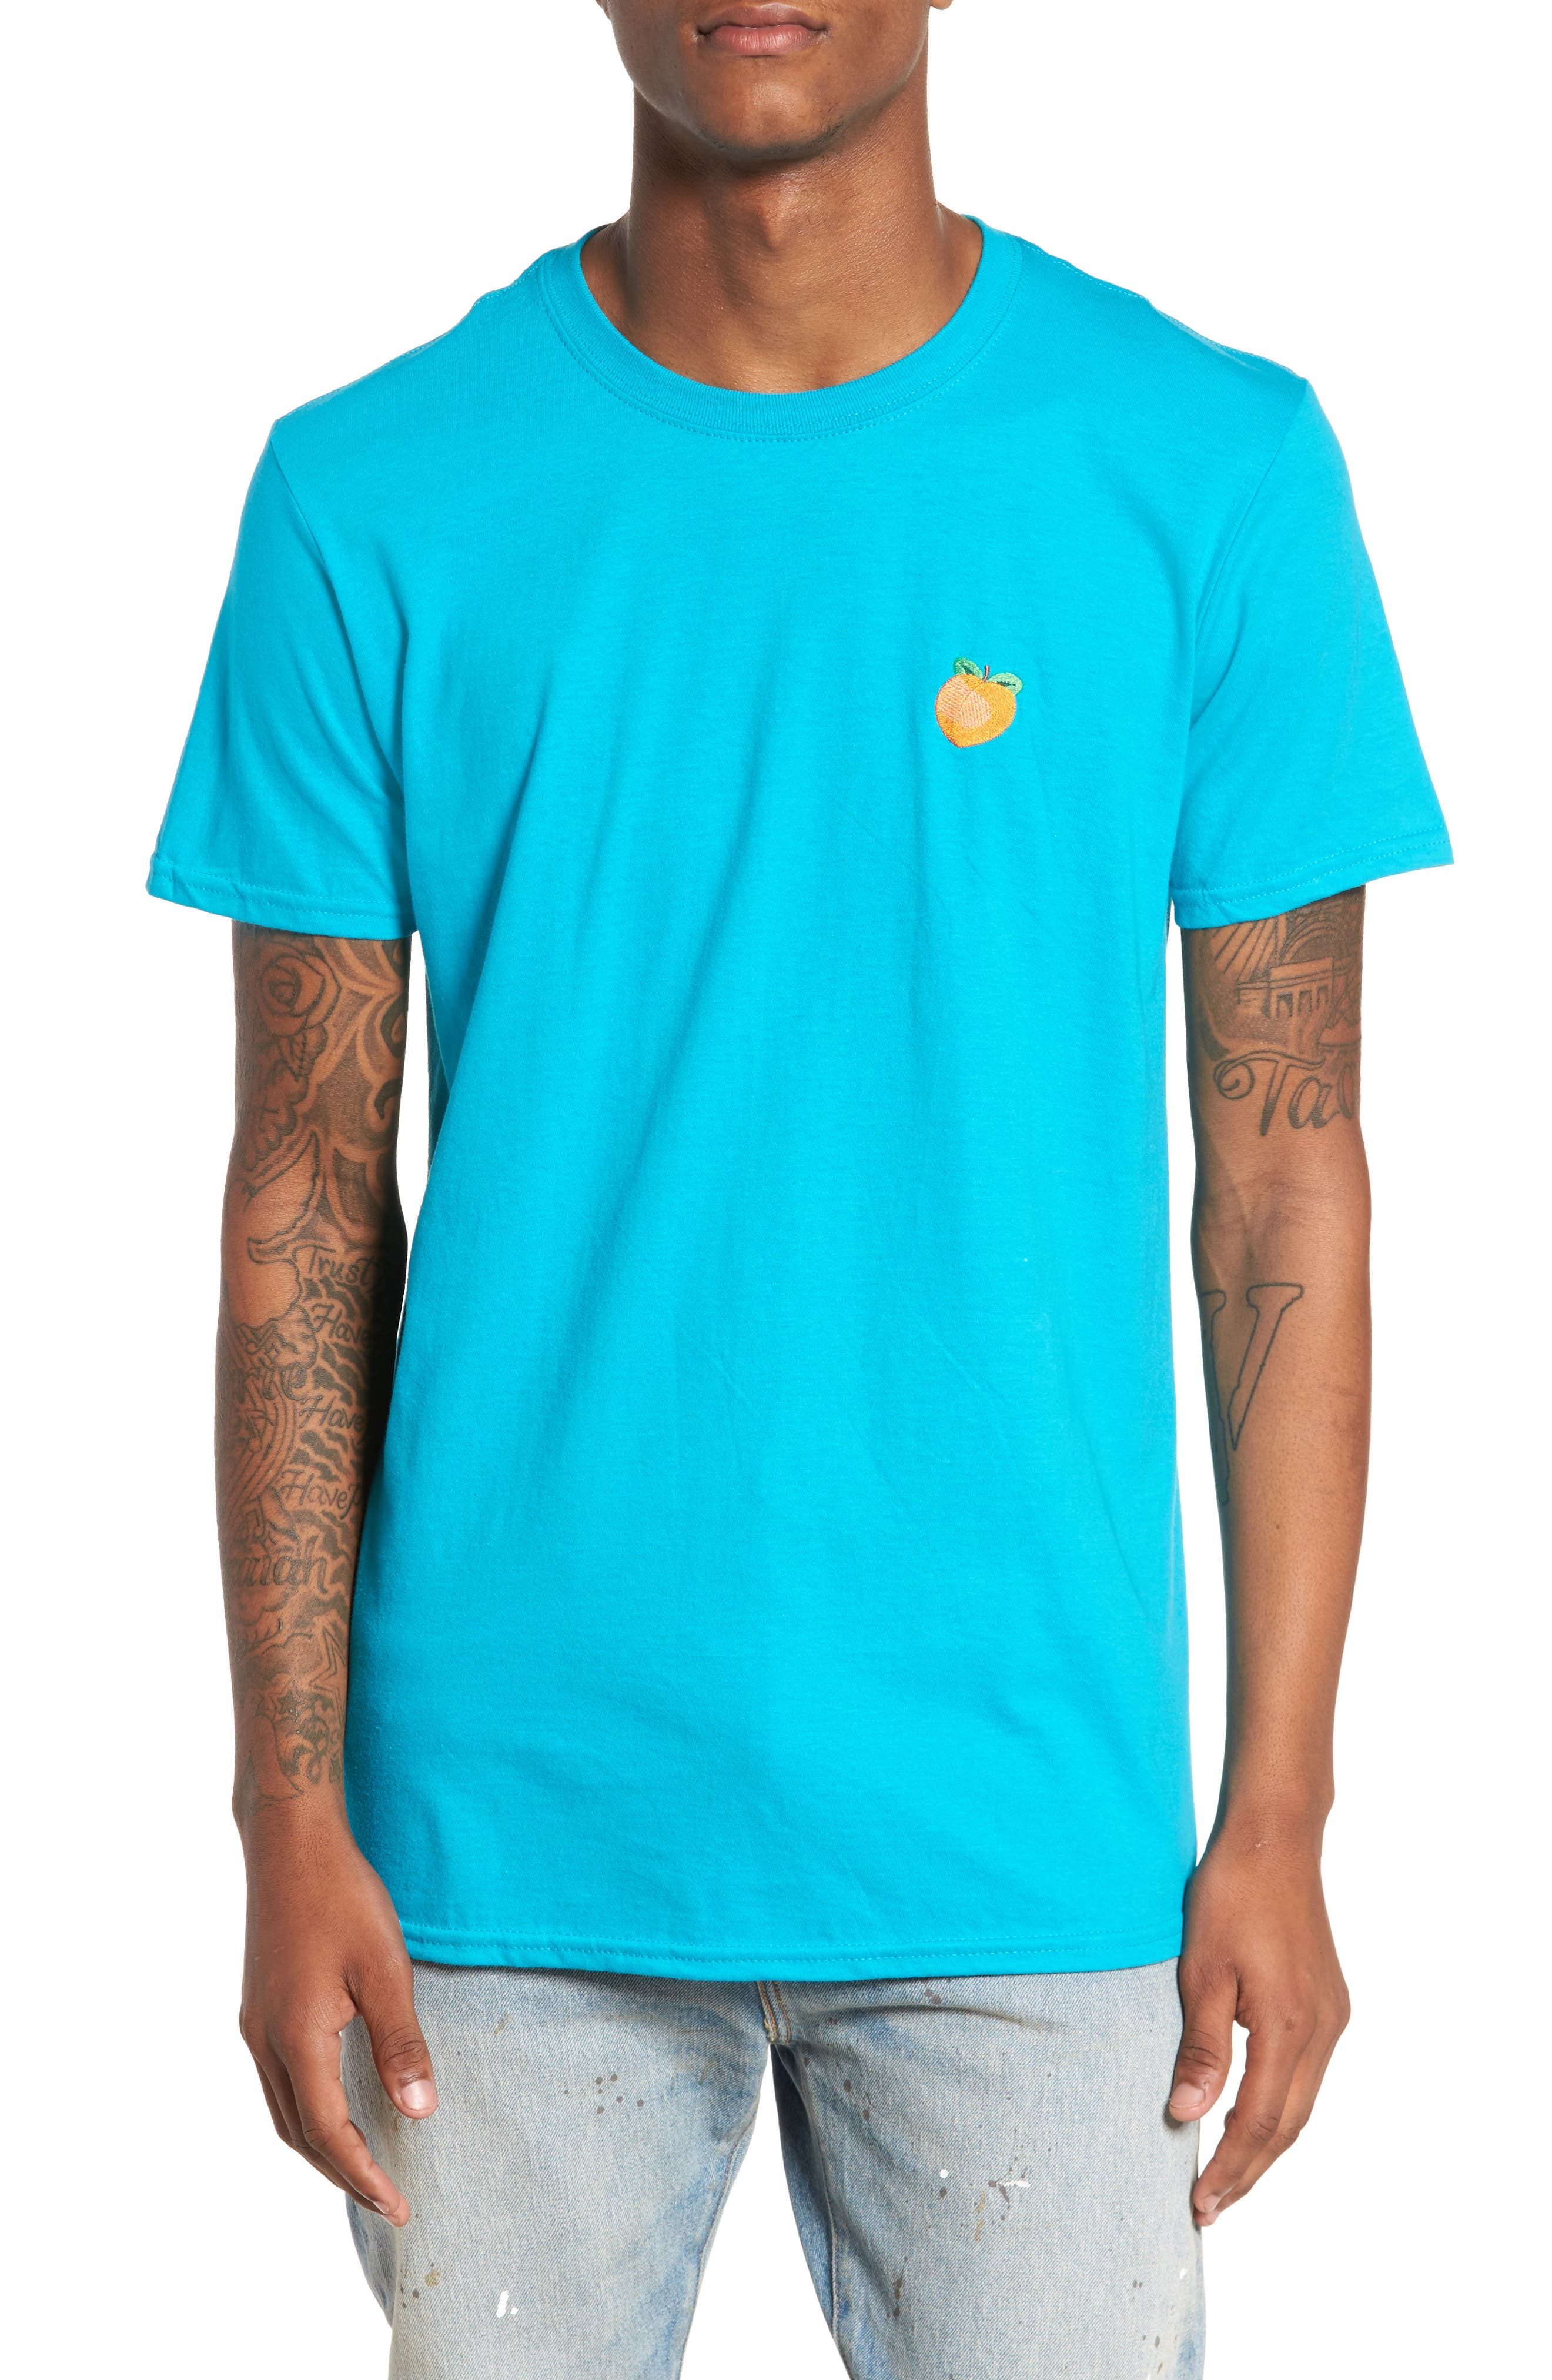 Main Image - The Rail Embroidered Peach T-Shirt